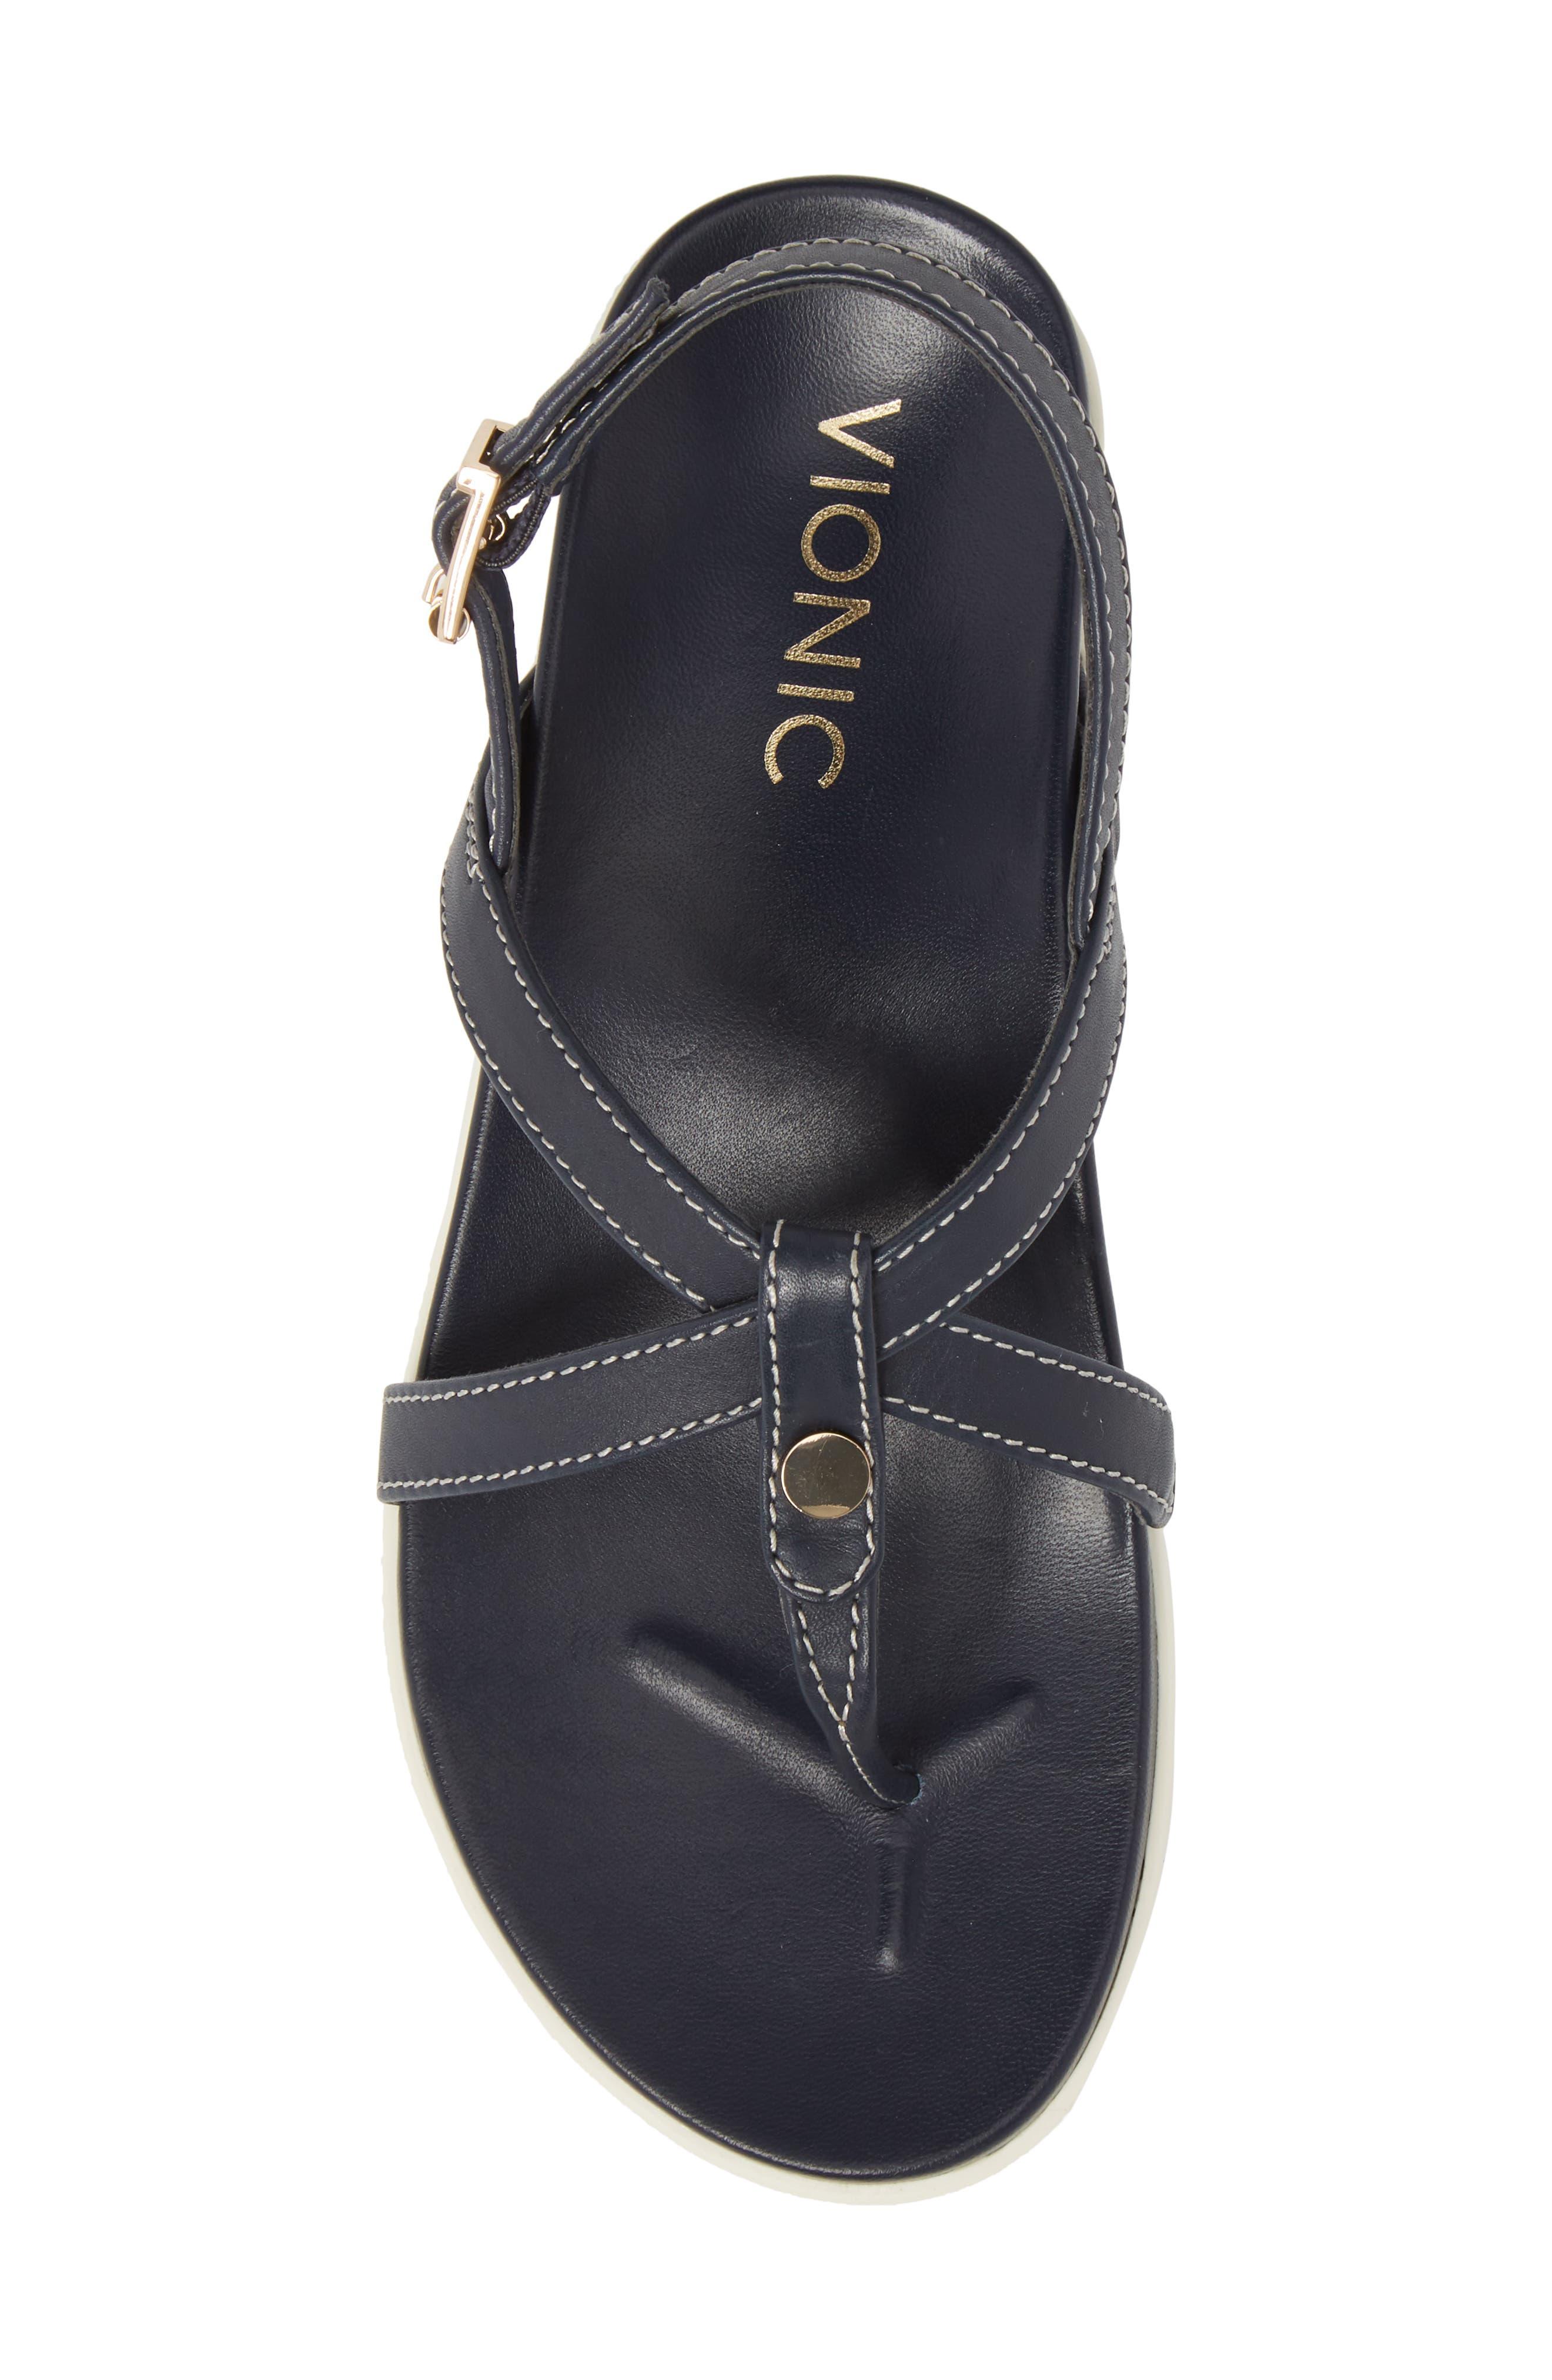 Veranda Orthaheel<sup>®</sup> Sandal,                             Alternate thumbnail 4, color,                             Navy Leather